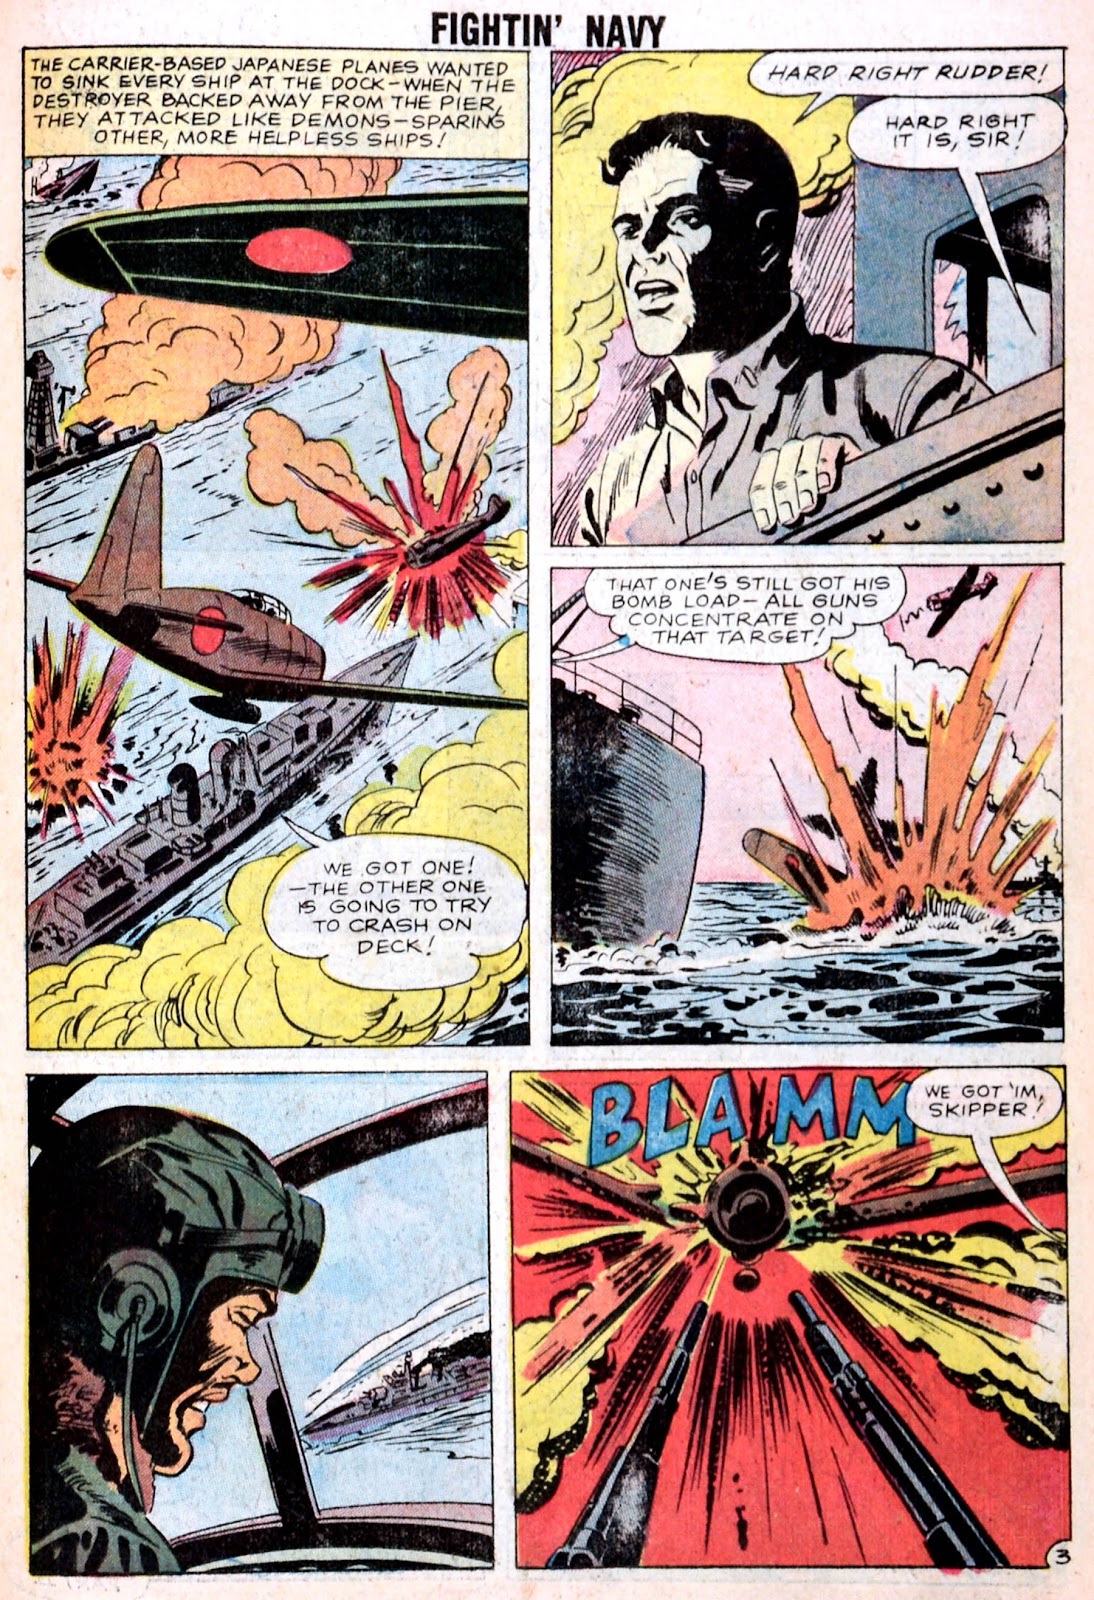 Read online Fightin' Navy comic -  Issue #85 - 11